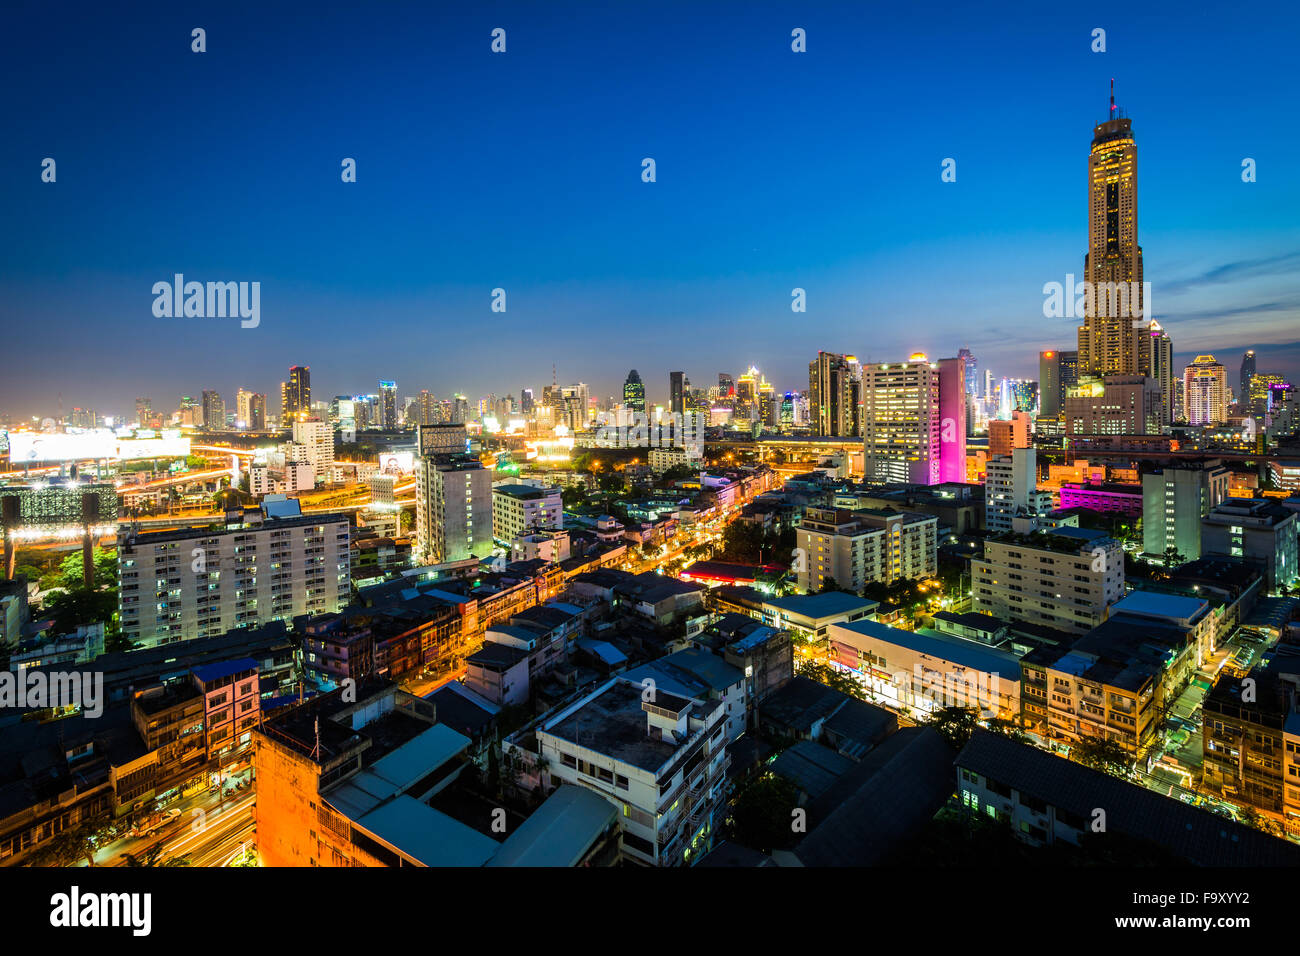 Vista del quartiere Ratchathewi al crepuscolo, a Bangkok, in Thailandia. Immagini Stock